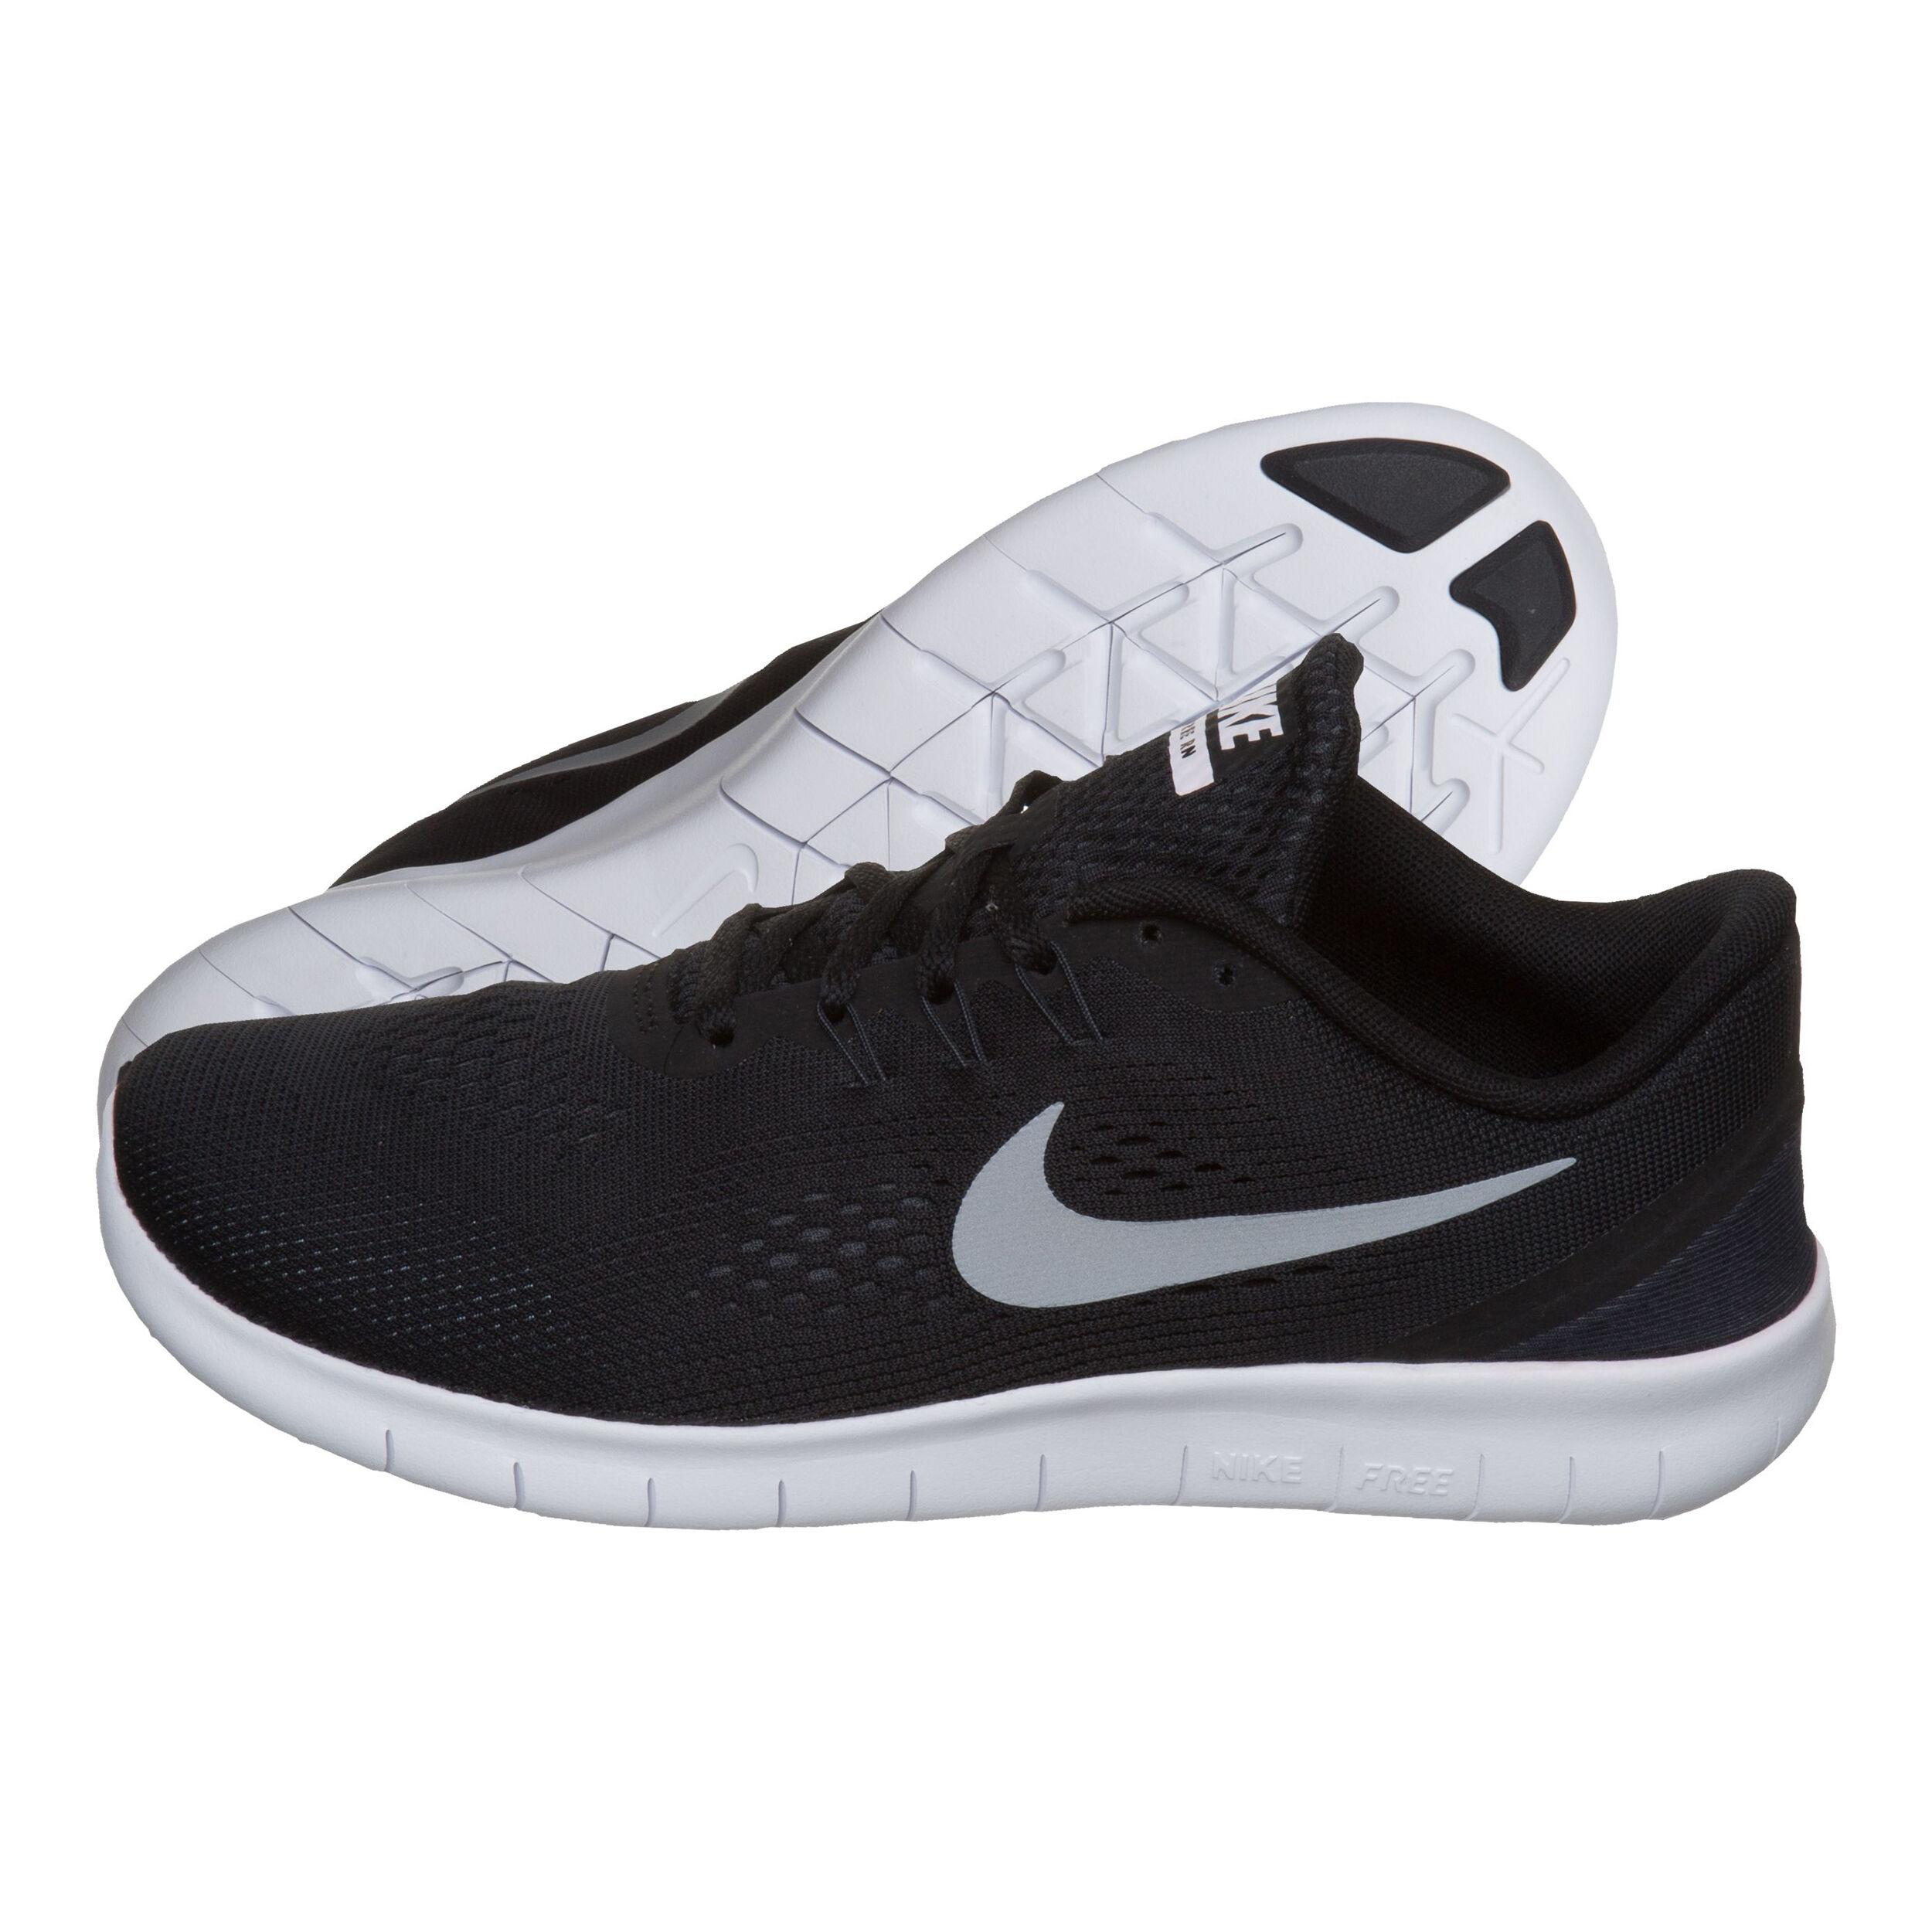 Nike Free RN Natural Running Schuh Kinder Schwarz, Silber